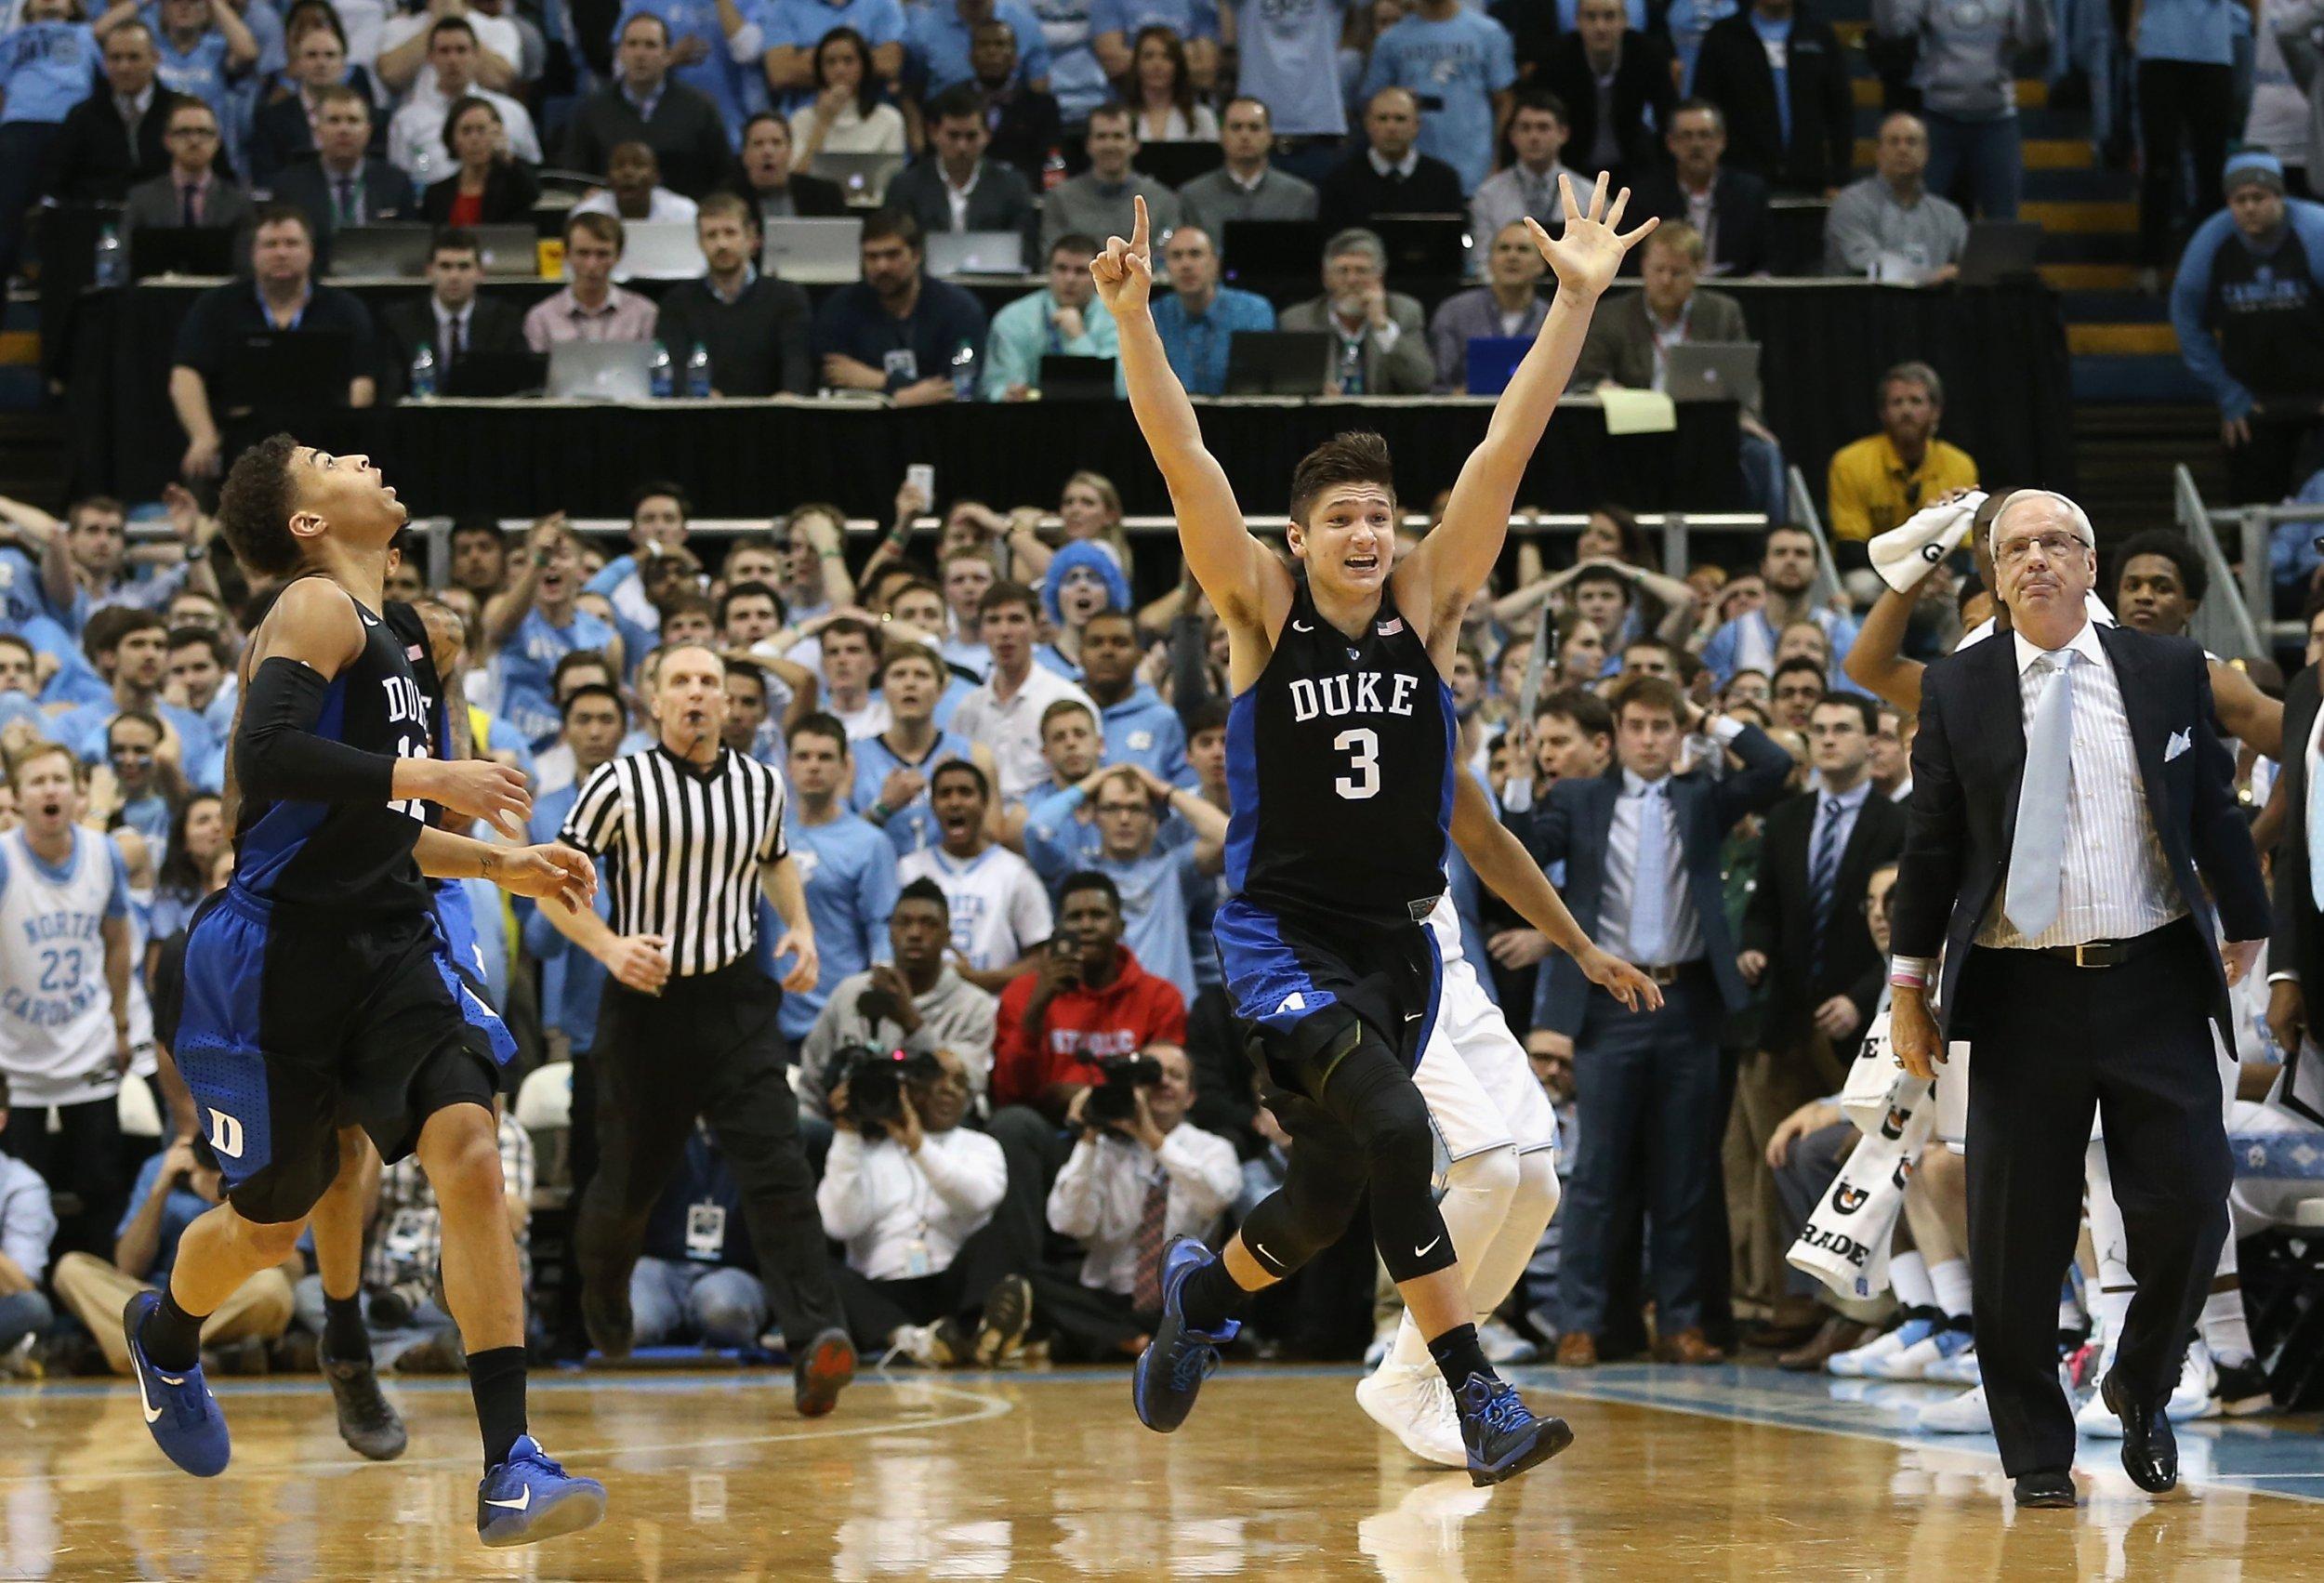 College Basketball Rankings: Duke and Arizona Vie for Top Spot at Start of 2017-18 Season